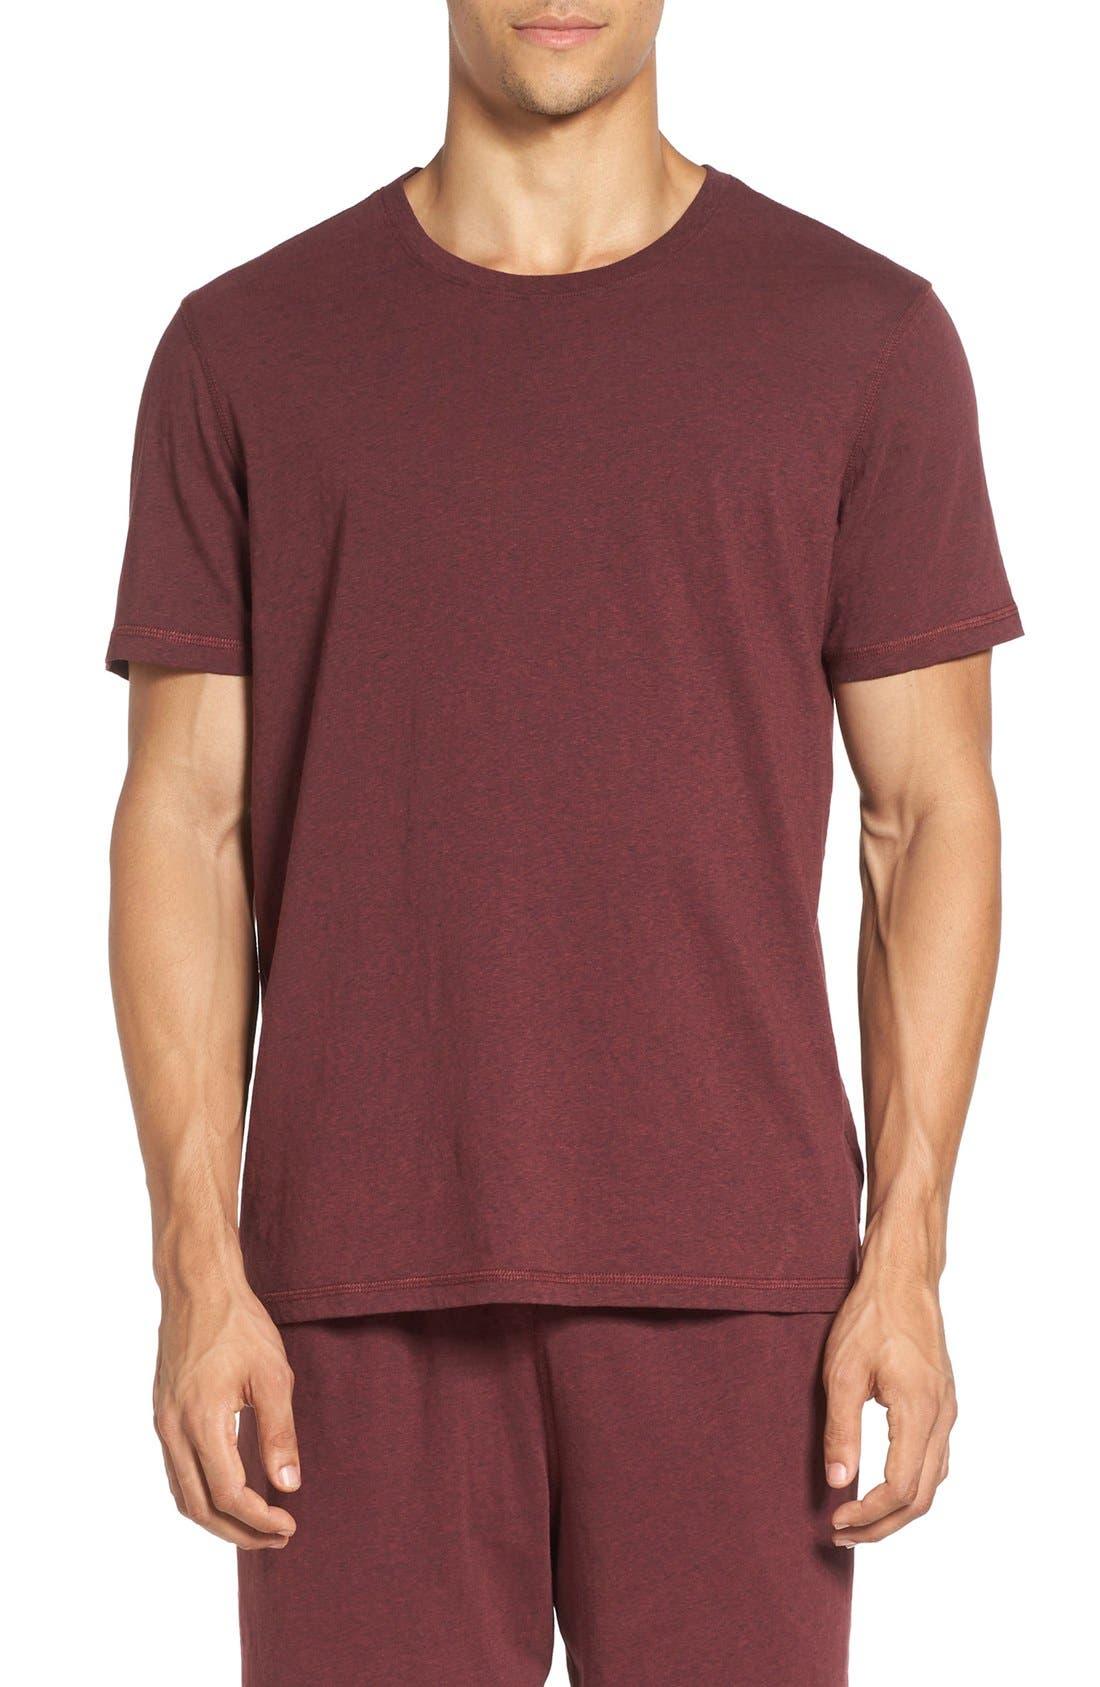 Main Image - Daniel Buchler Recycled Cotton Blend T-Shirt